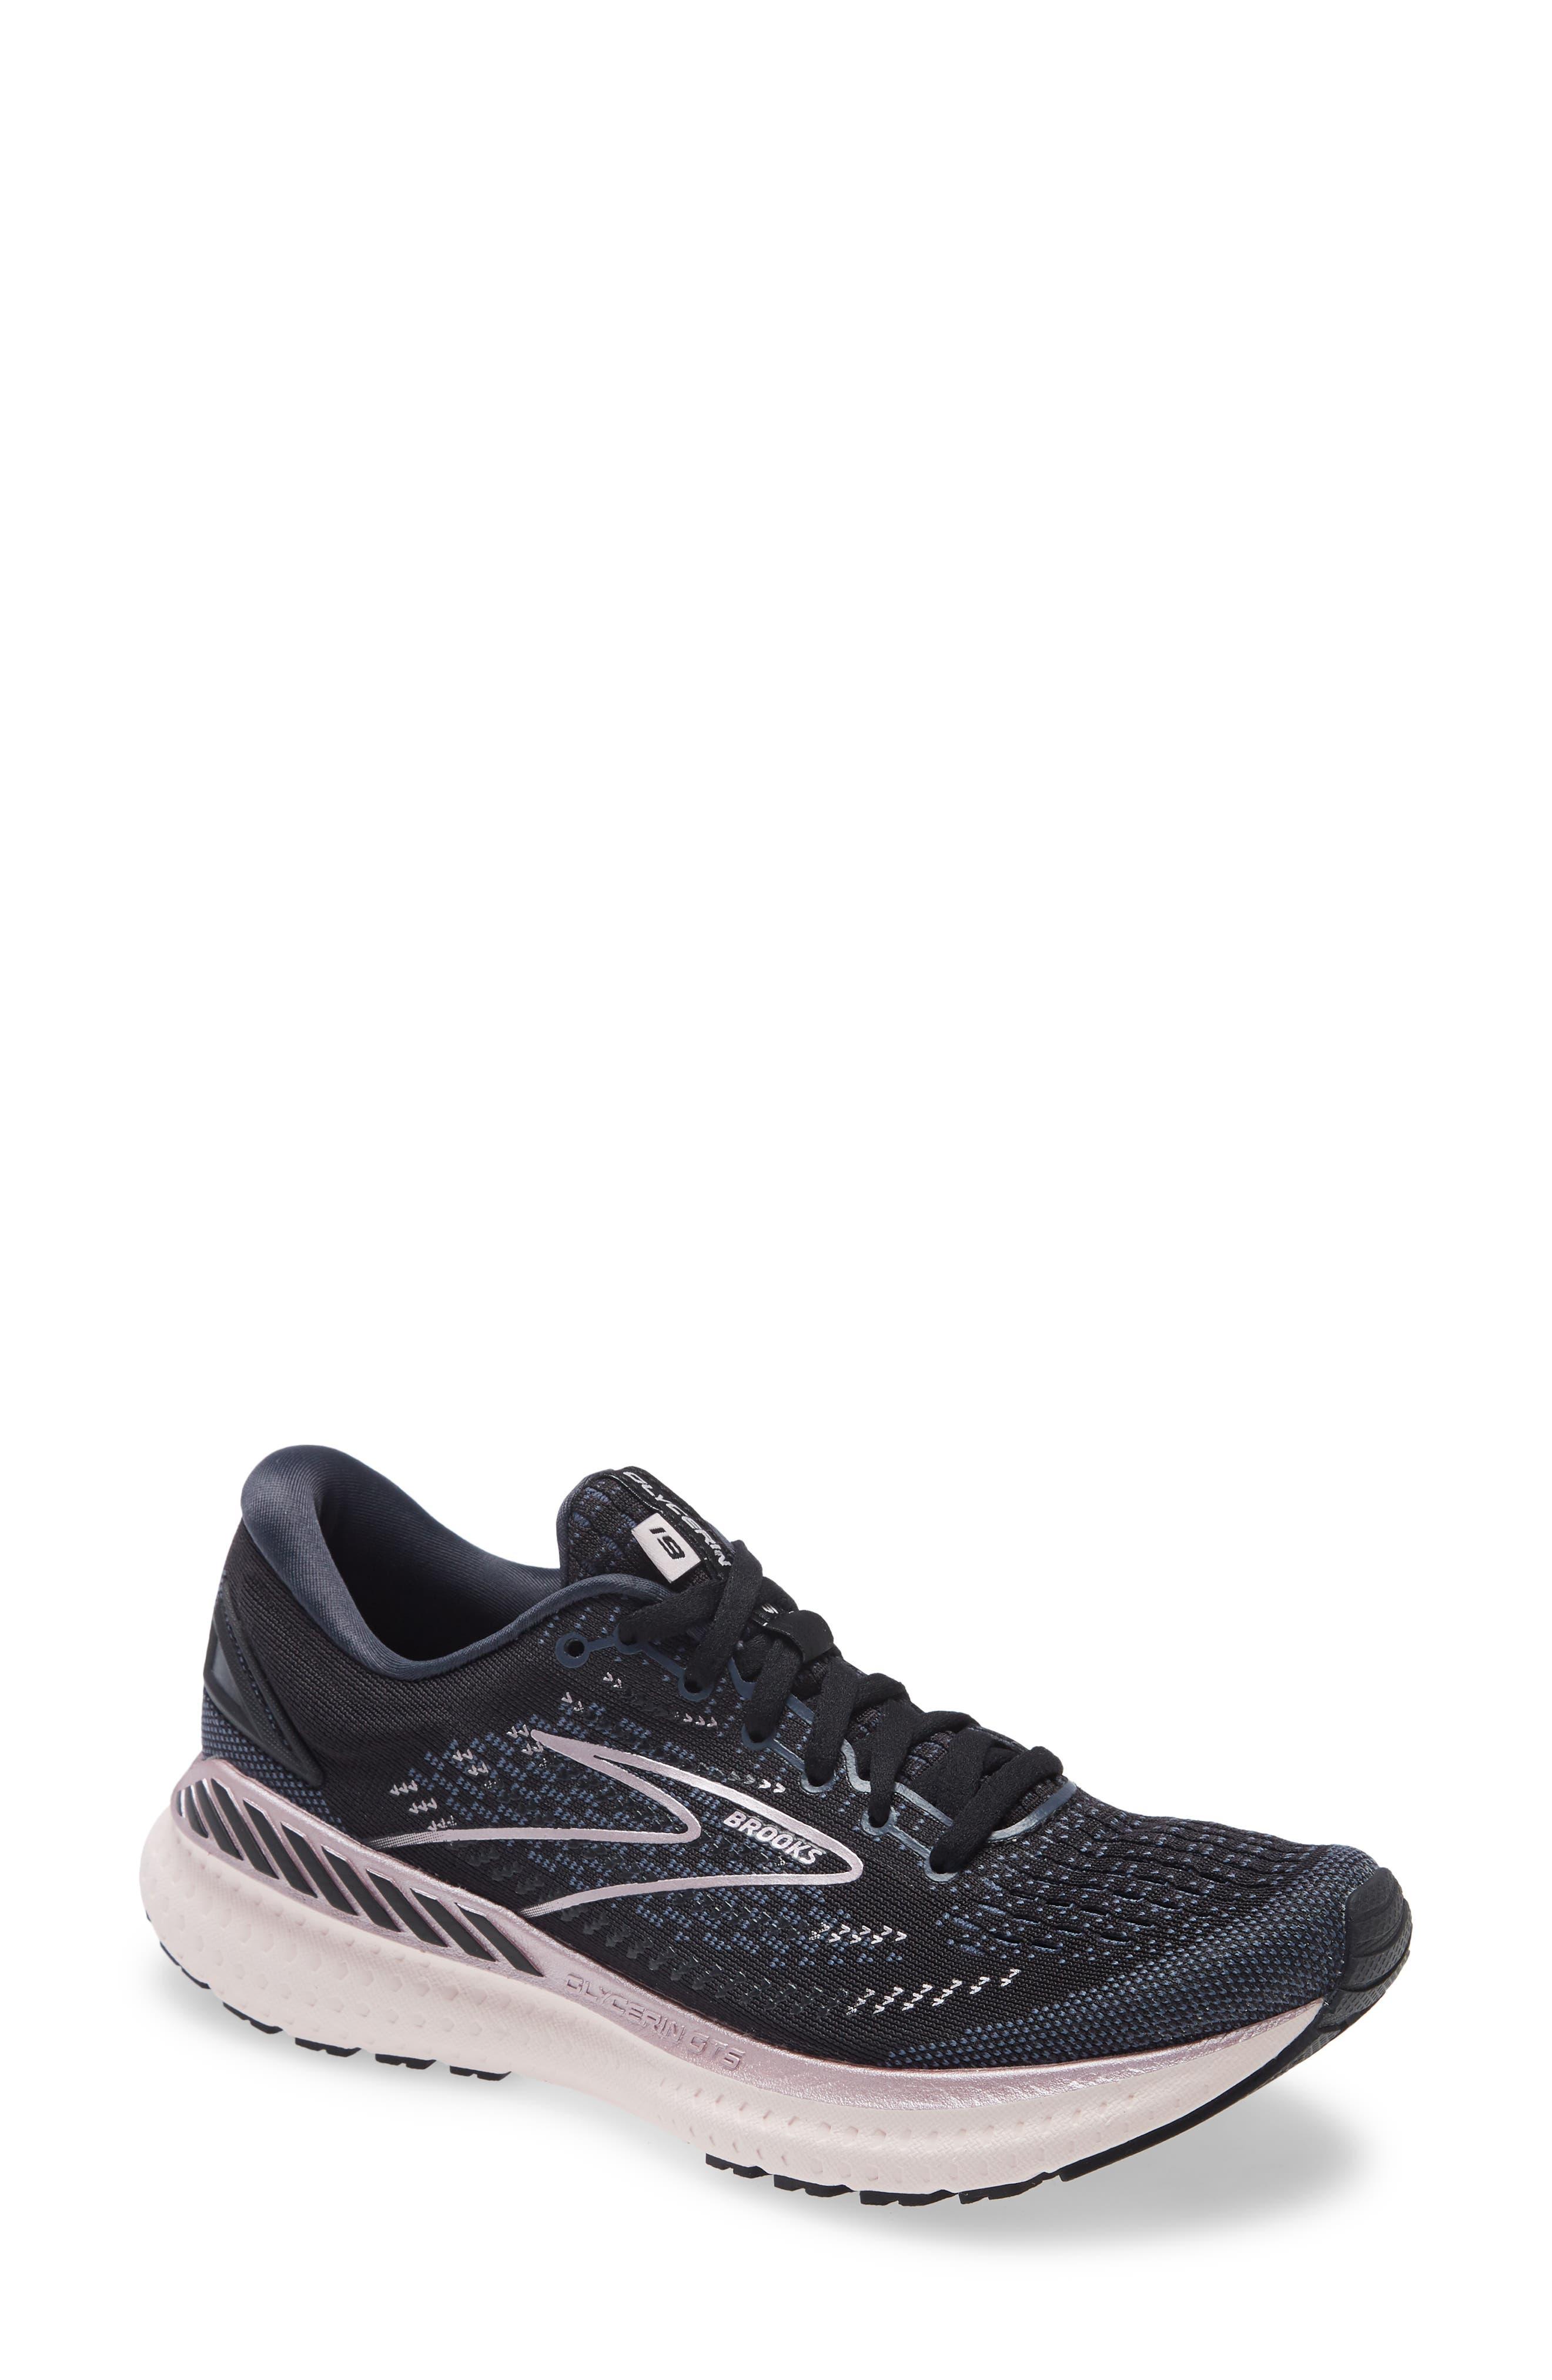 Glycerin Gts 19 Running Shoe